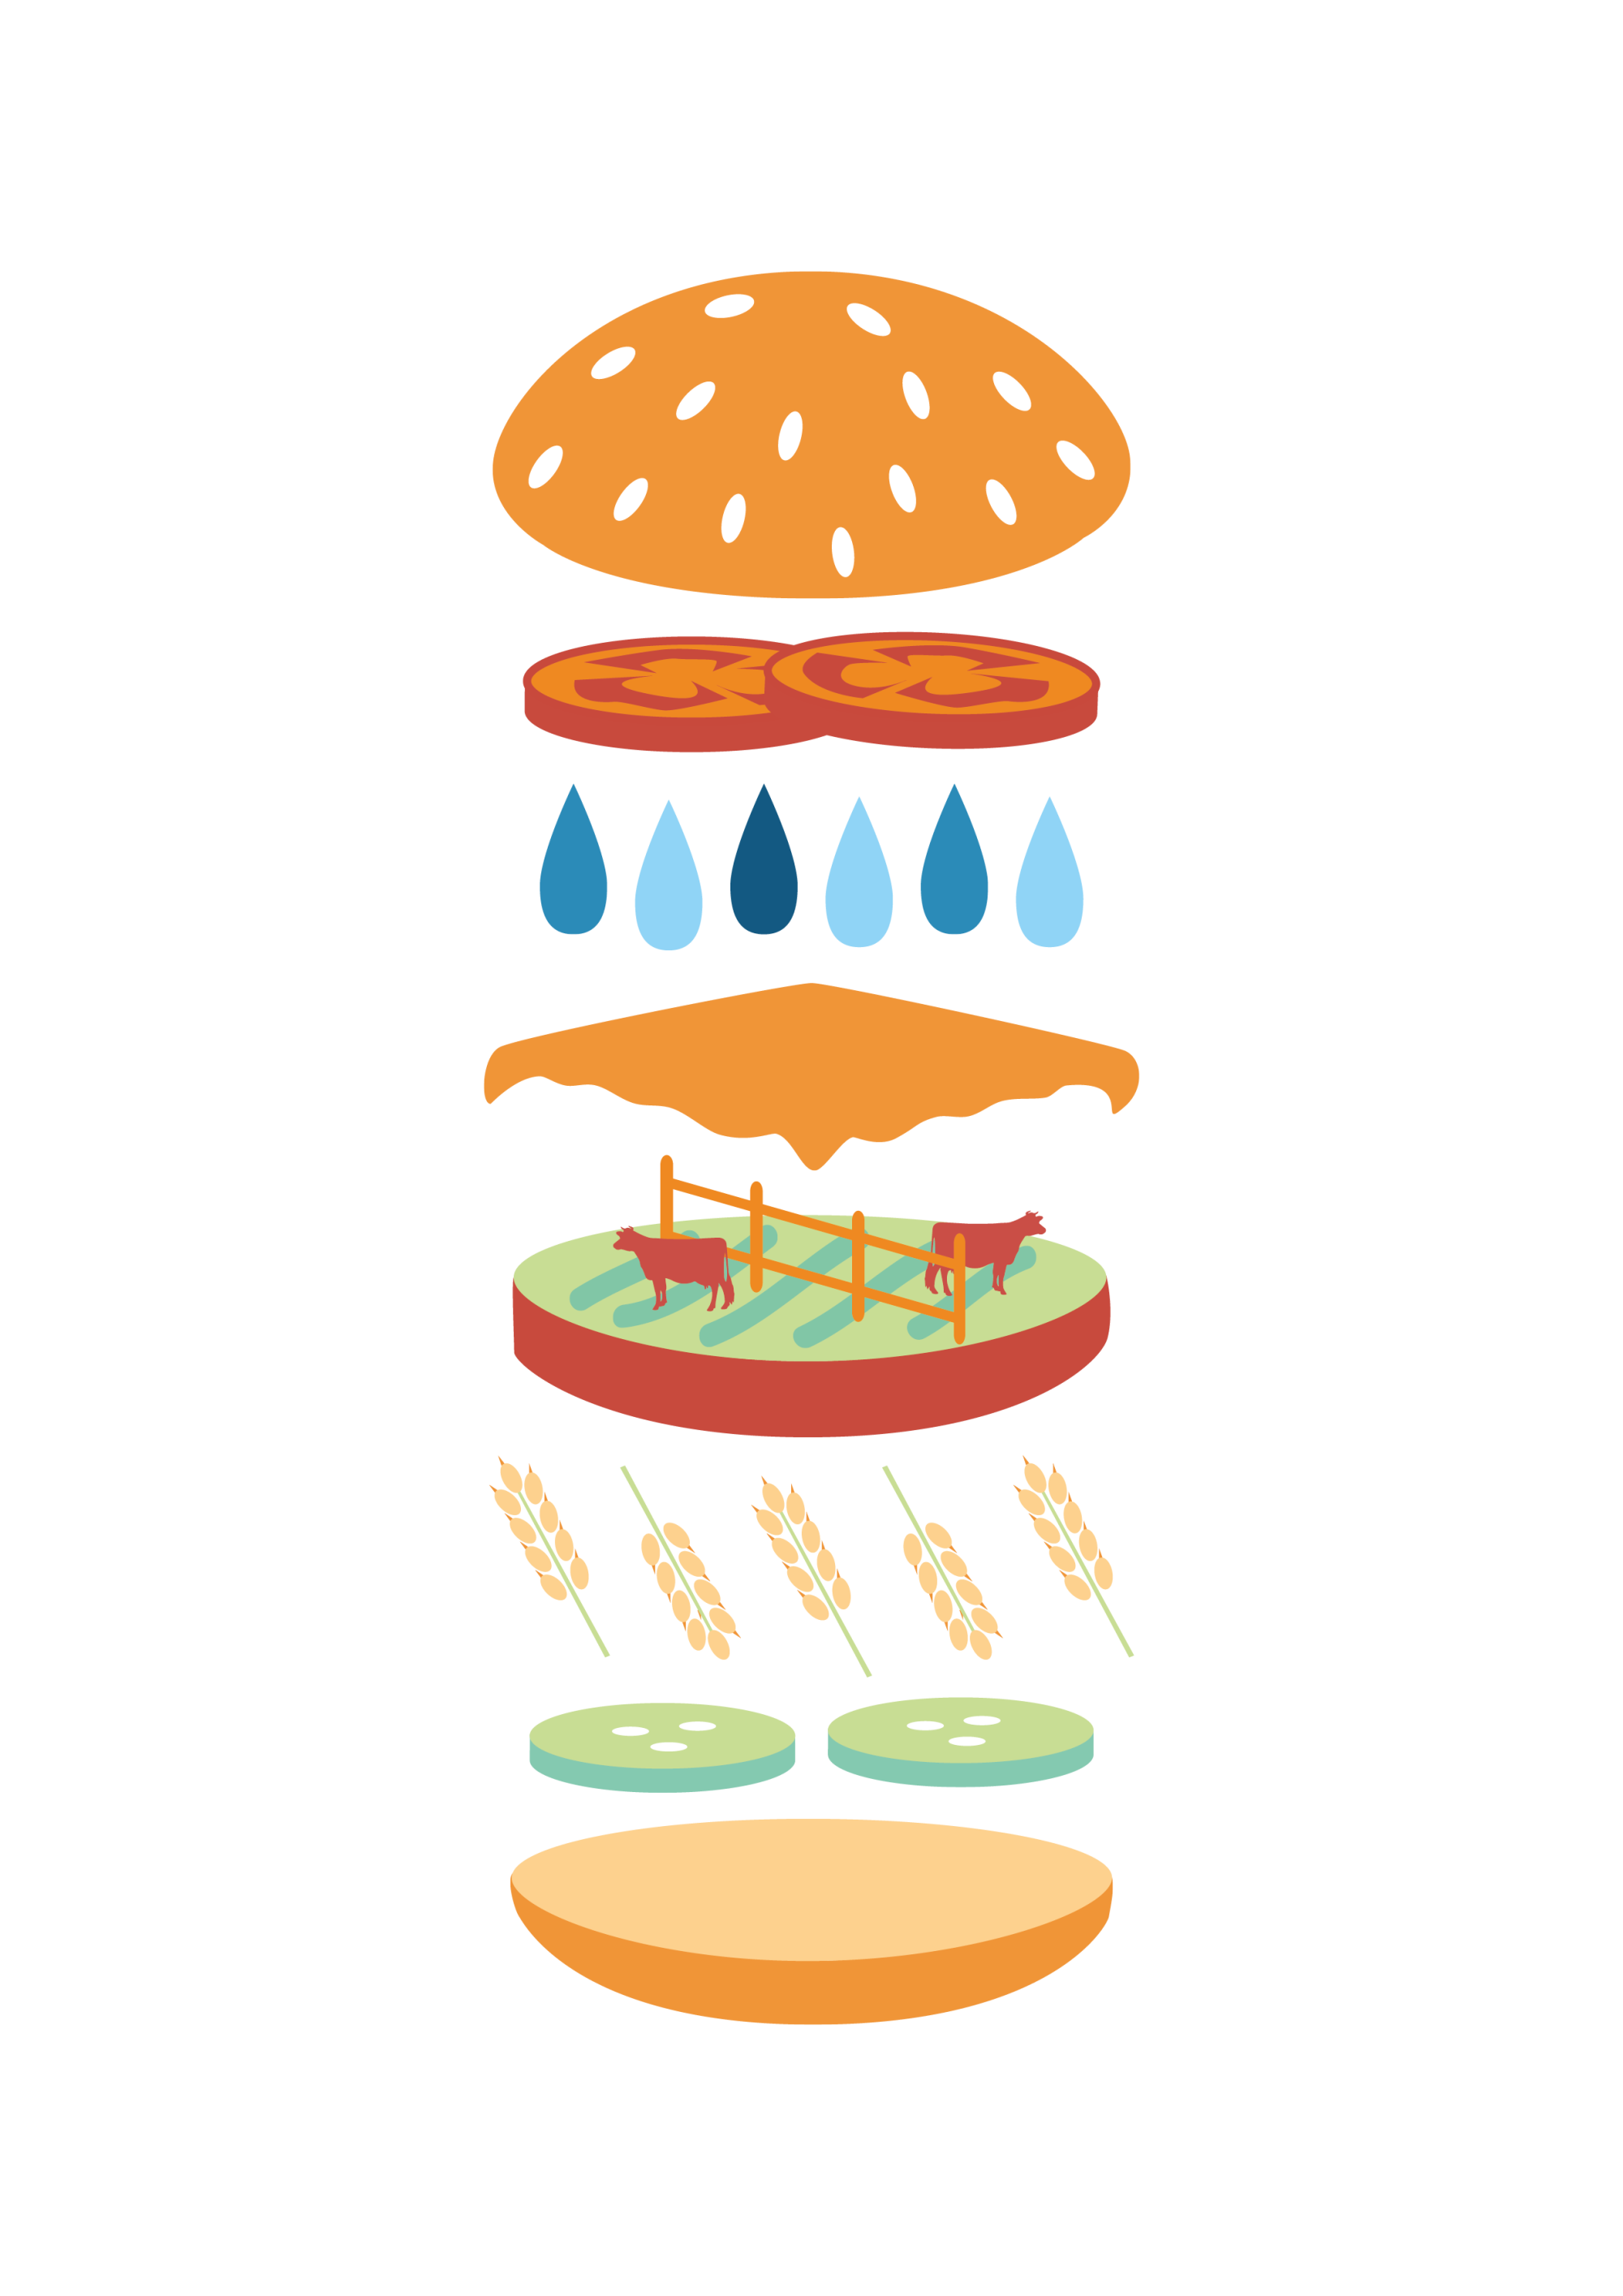 Taste clipart disgusting food. Roisin scosa hopes that